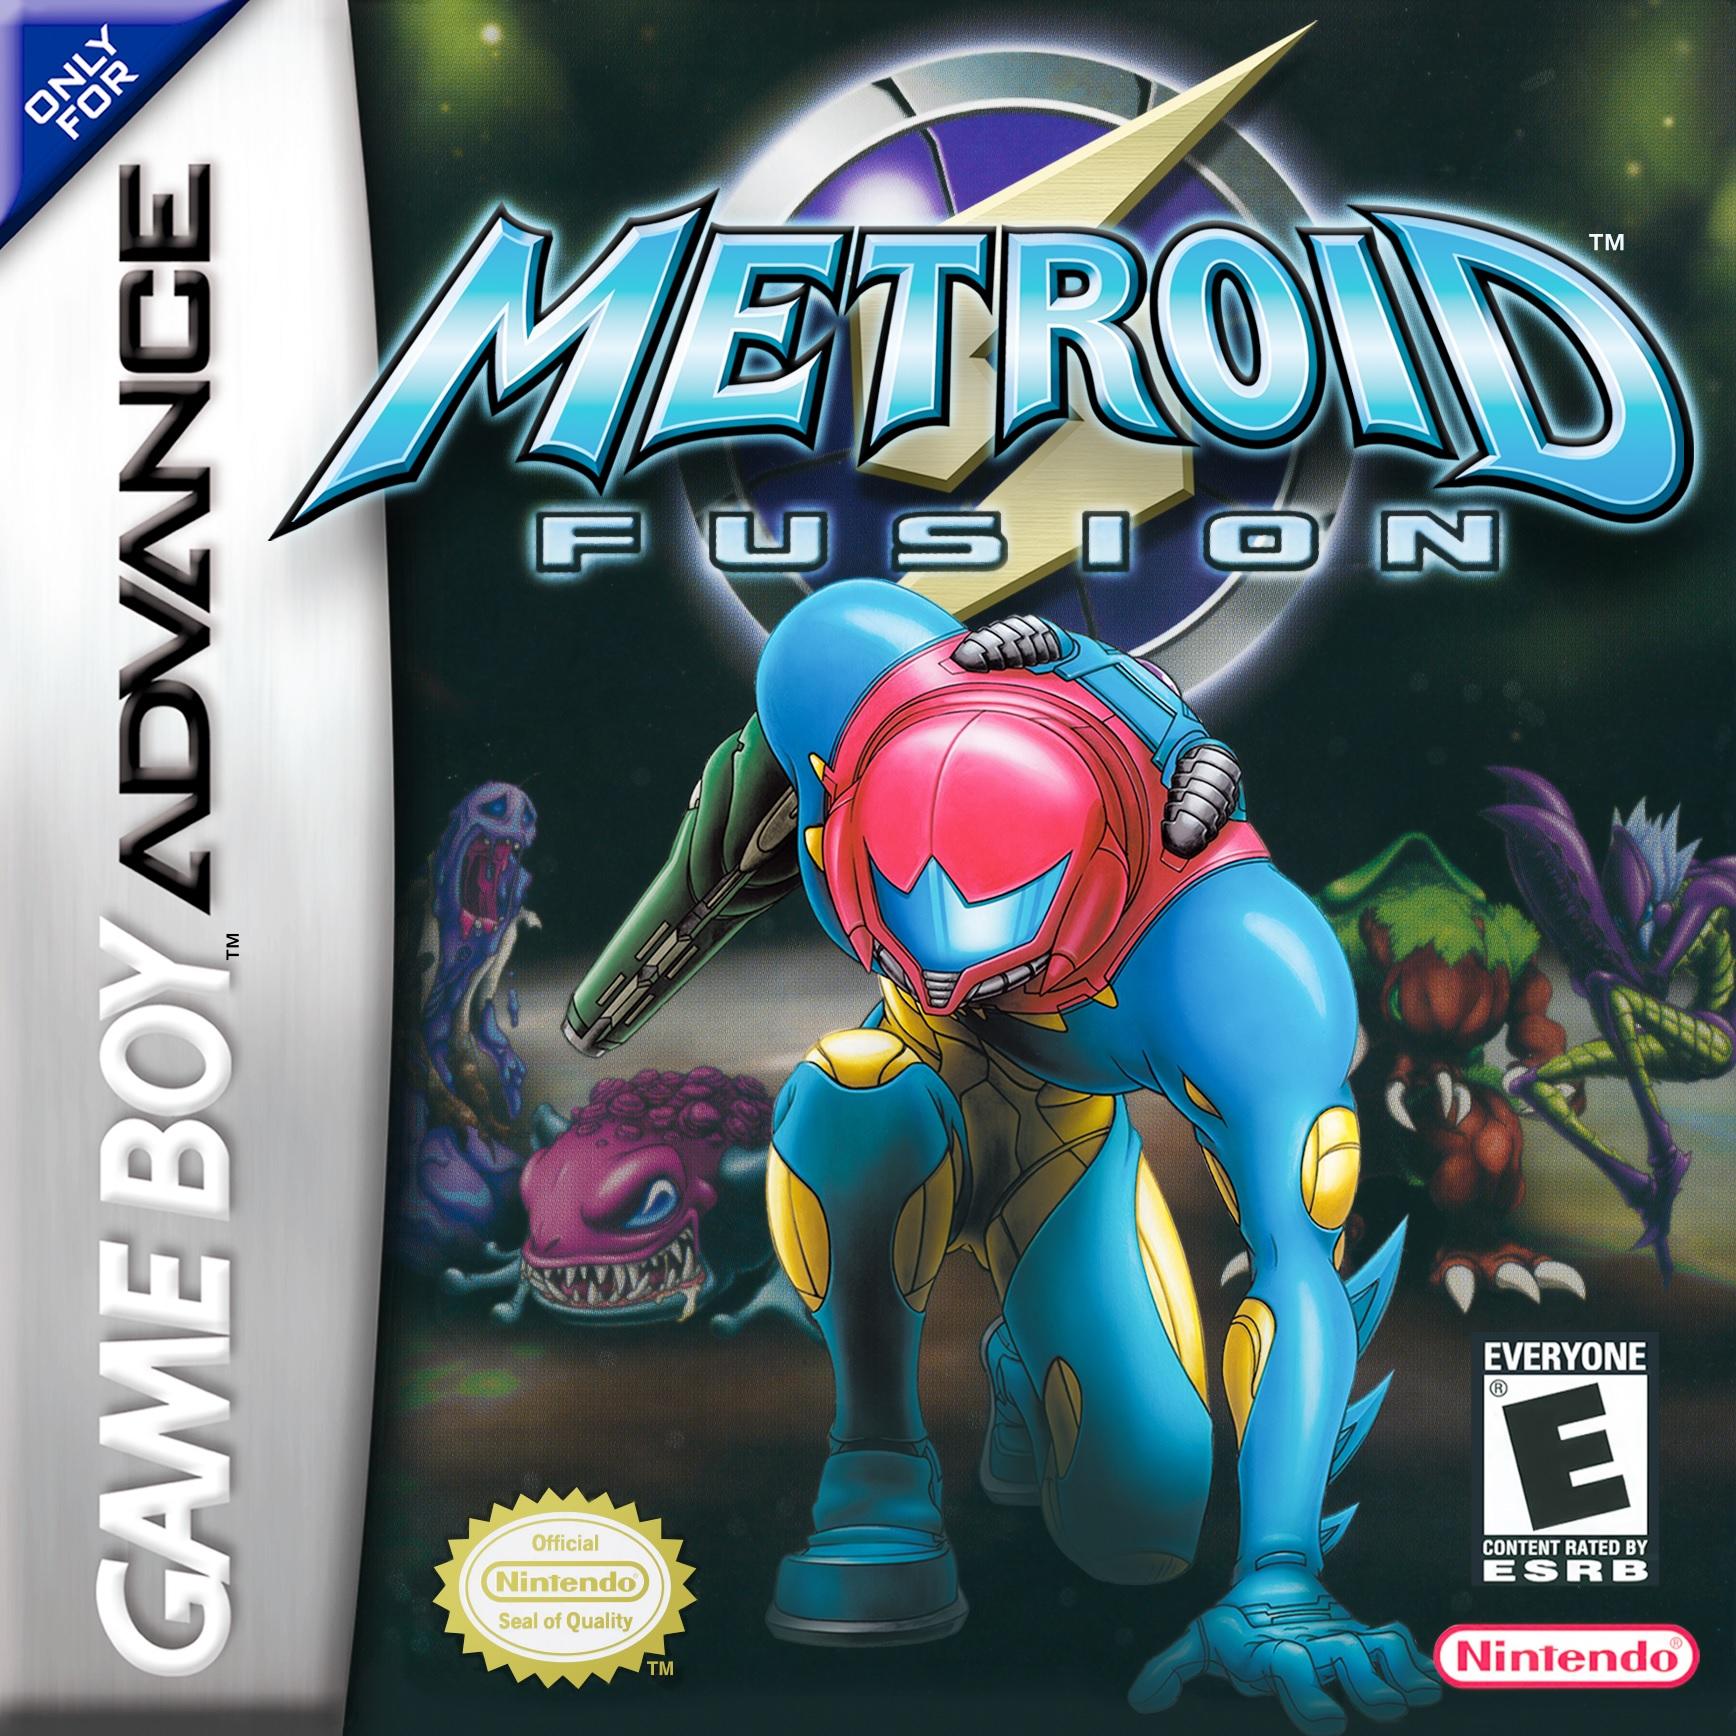 File:Metroid Fusion box art.jpg